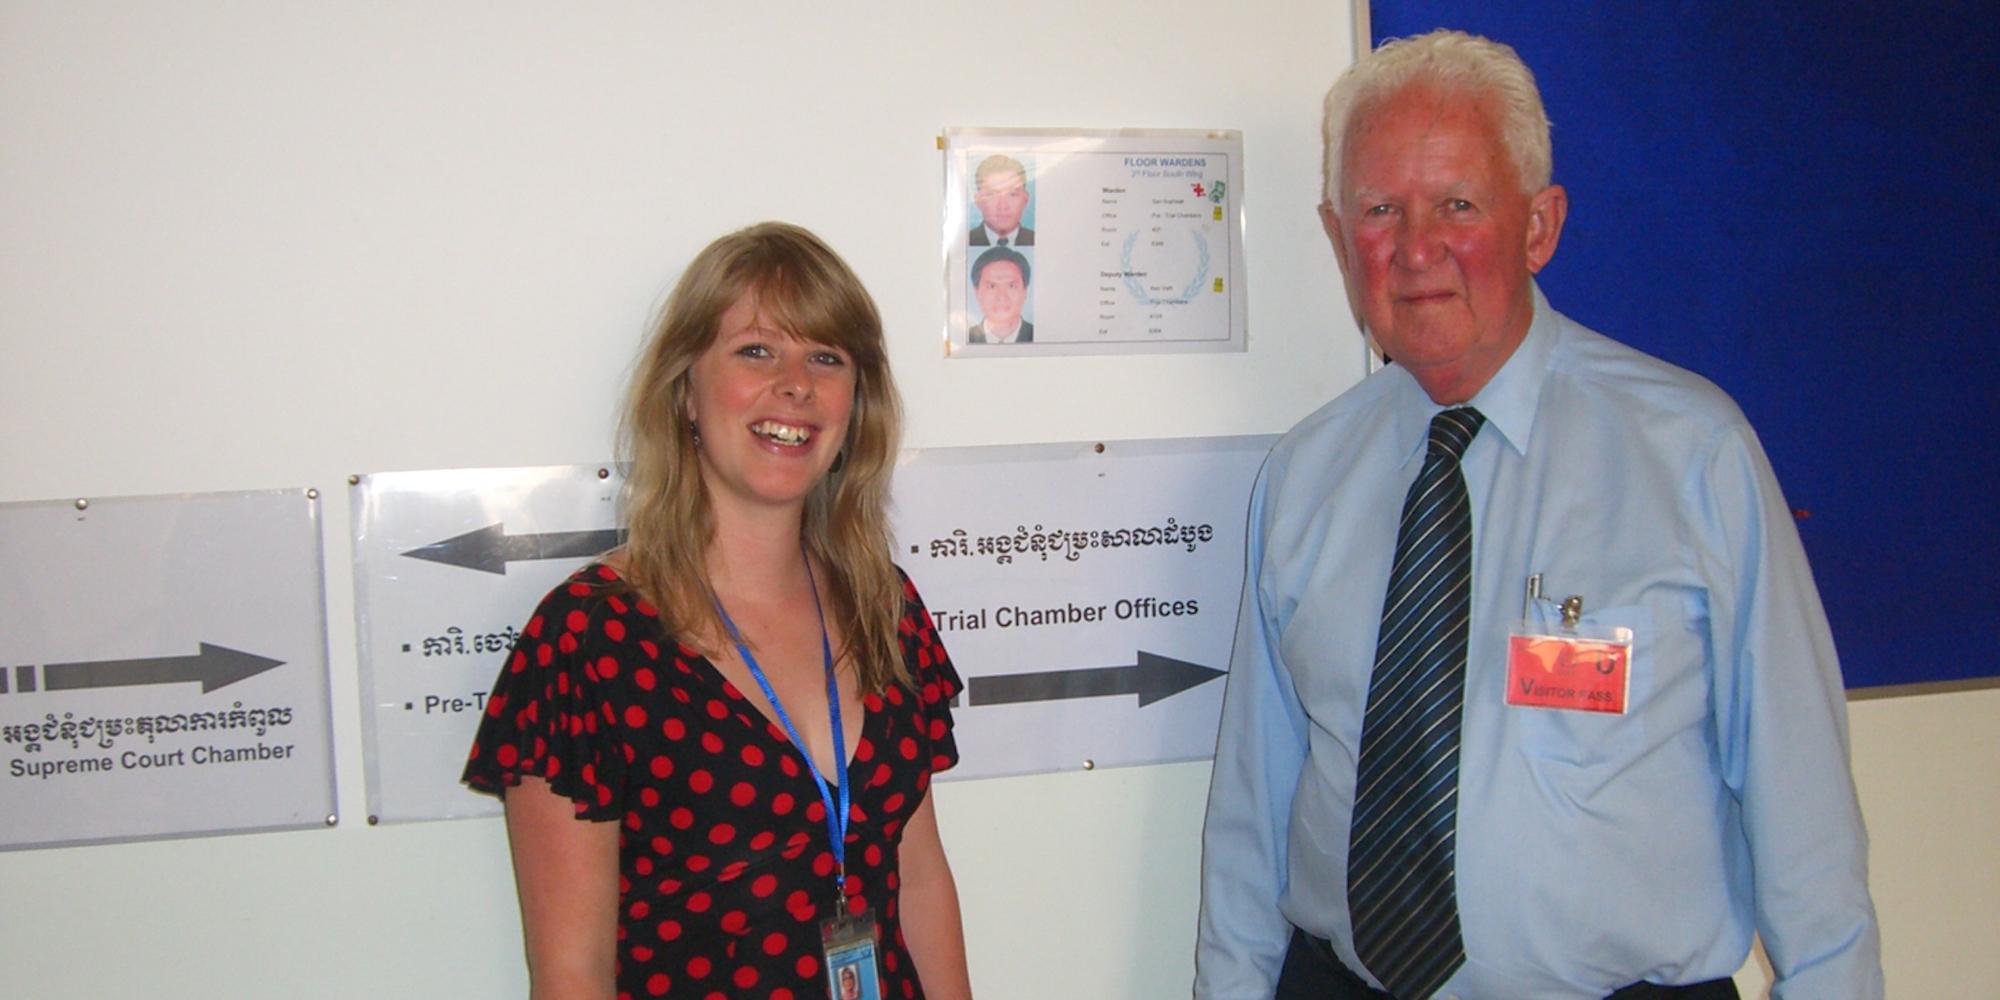 Heidi Edwards and The Hon Alastair Nicholson AO RFD QC